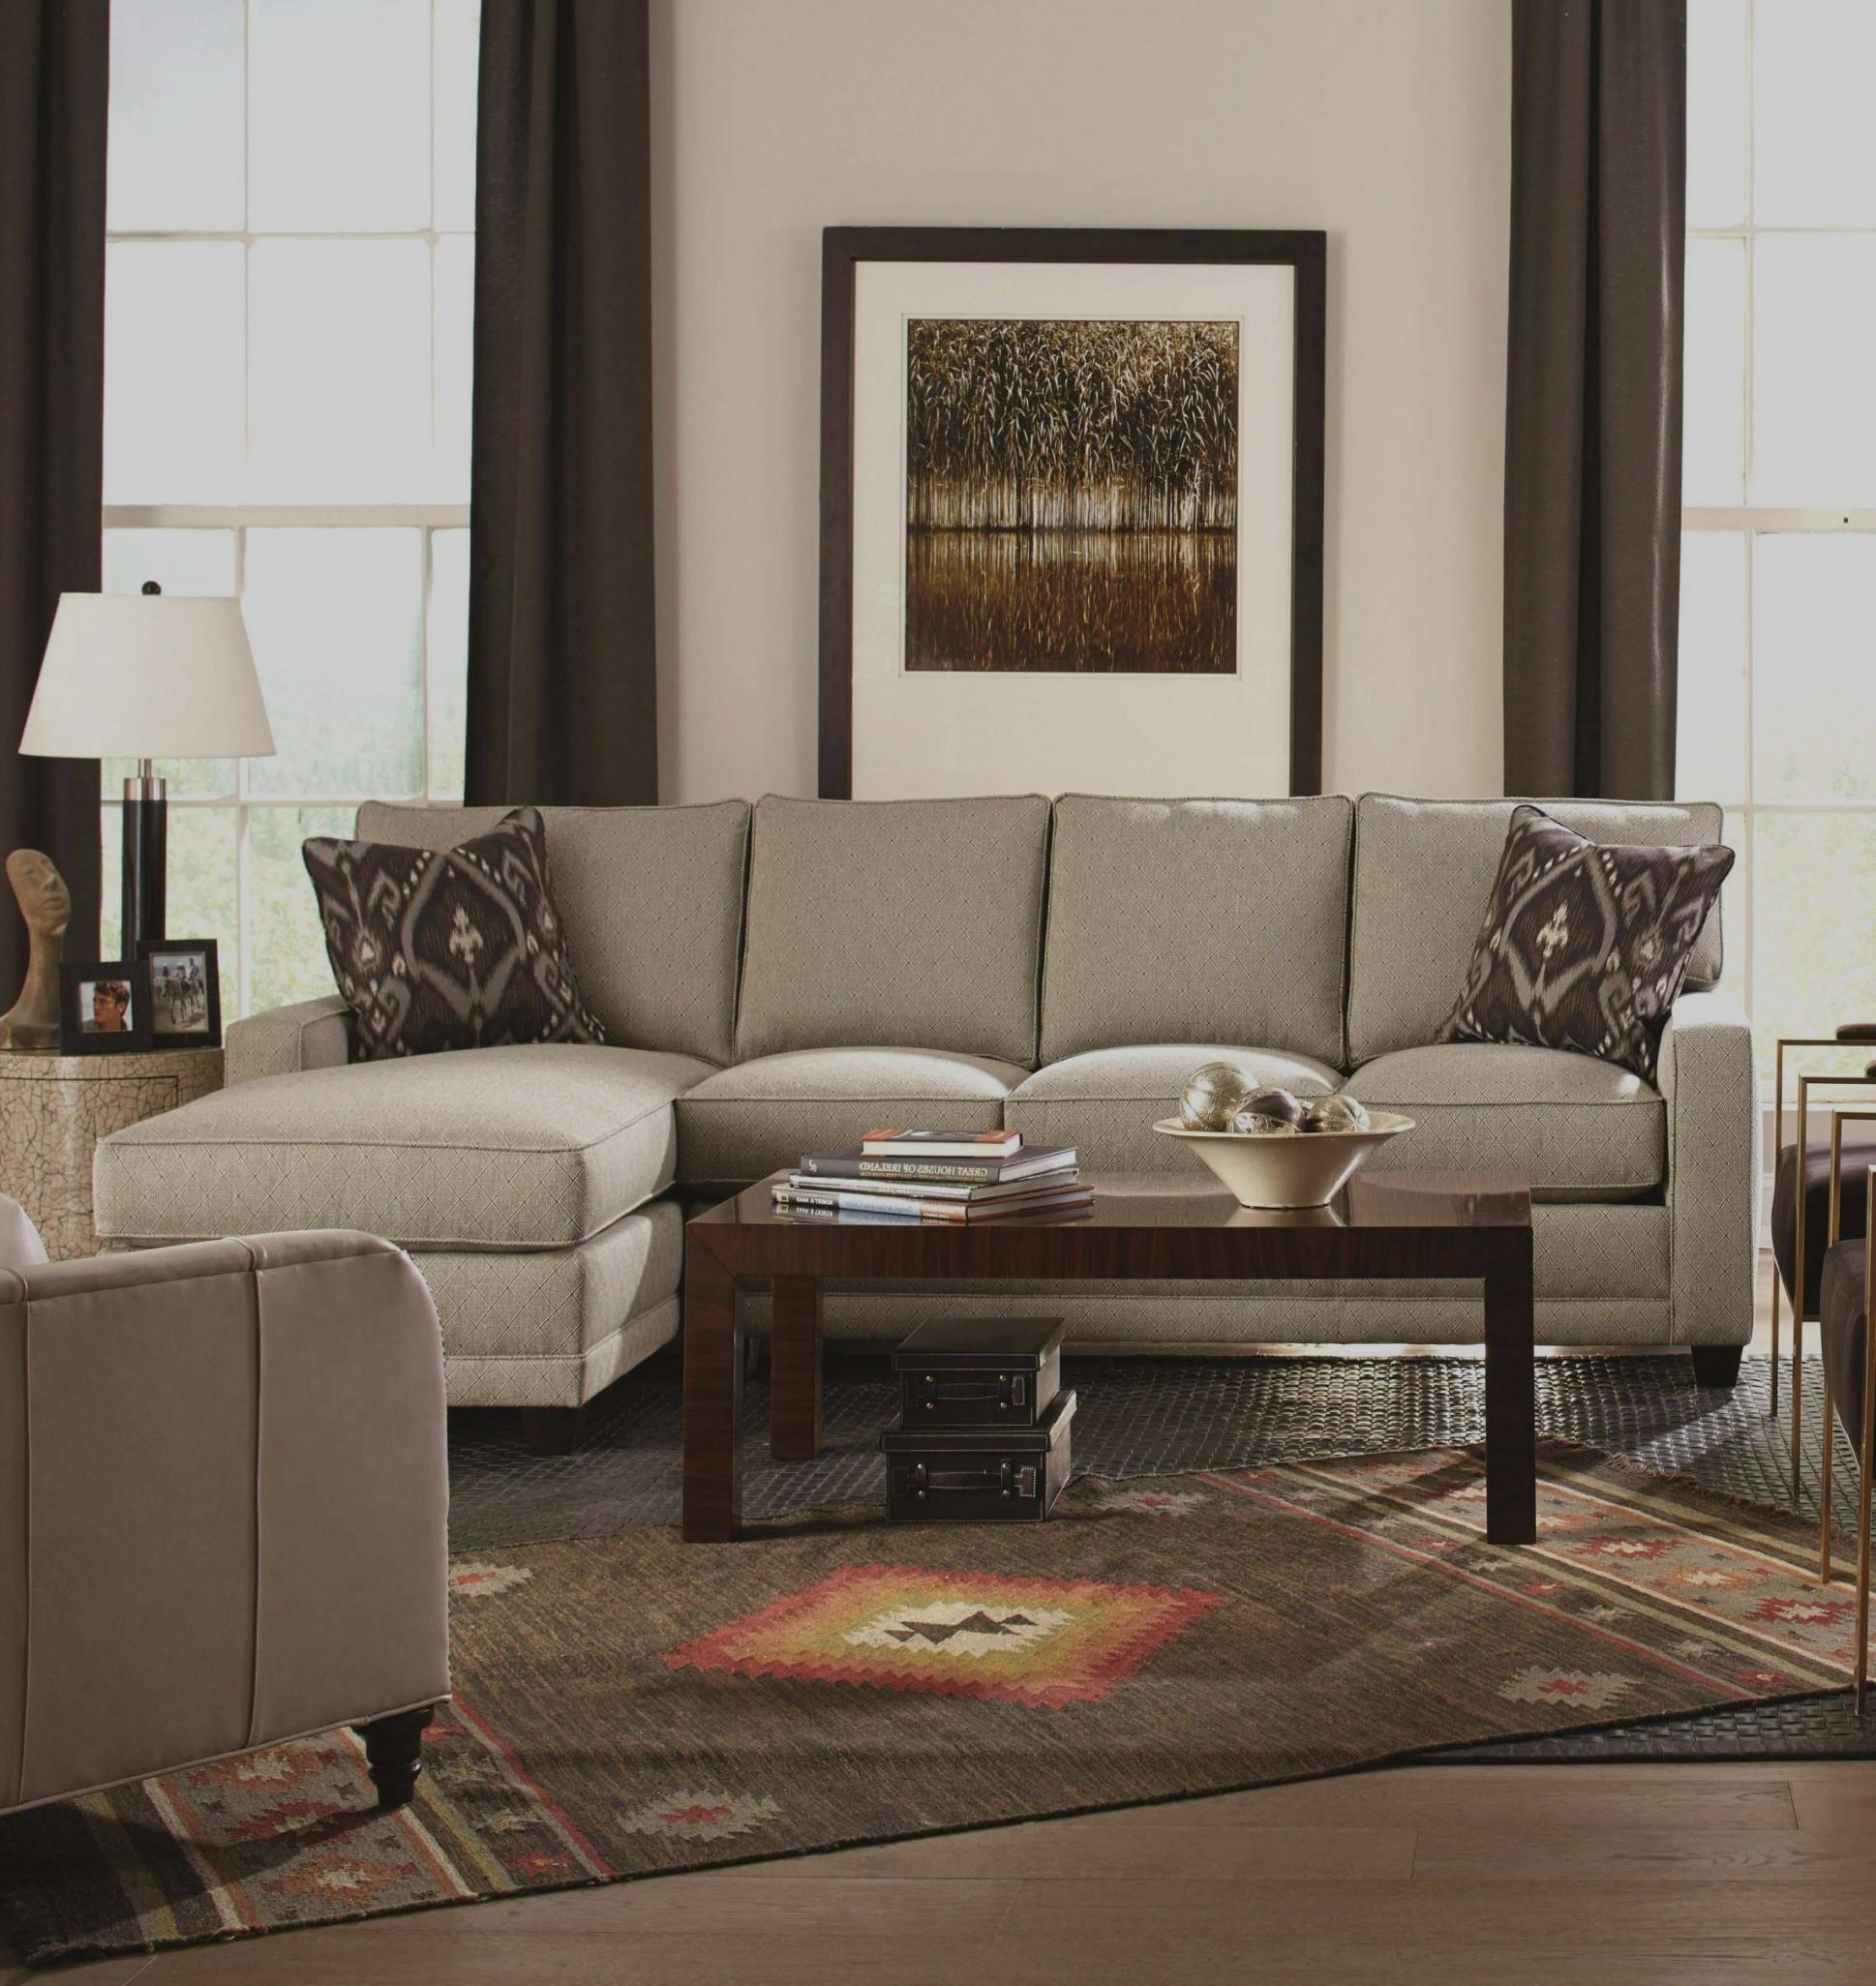 17 Lovely Decorating With Dark Hardwood Floors